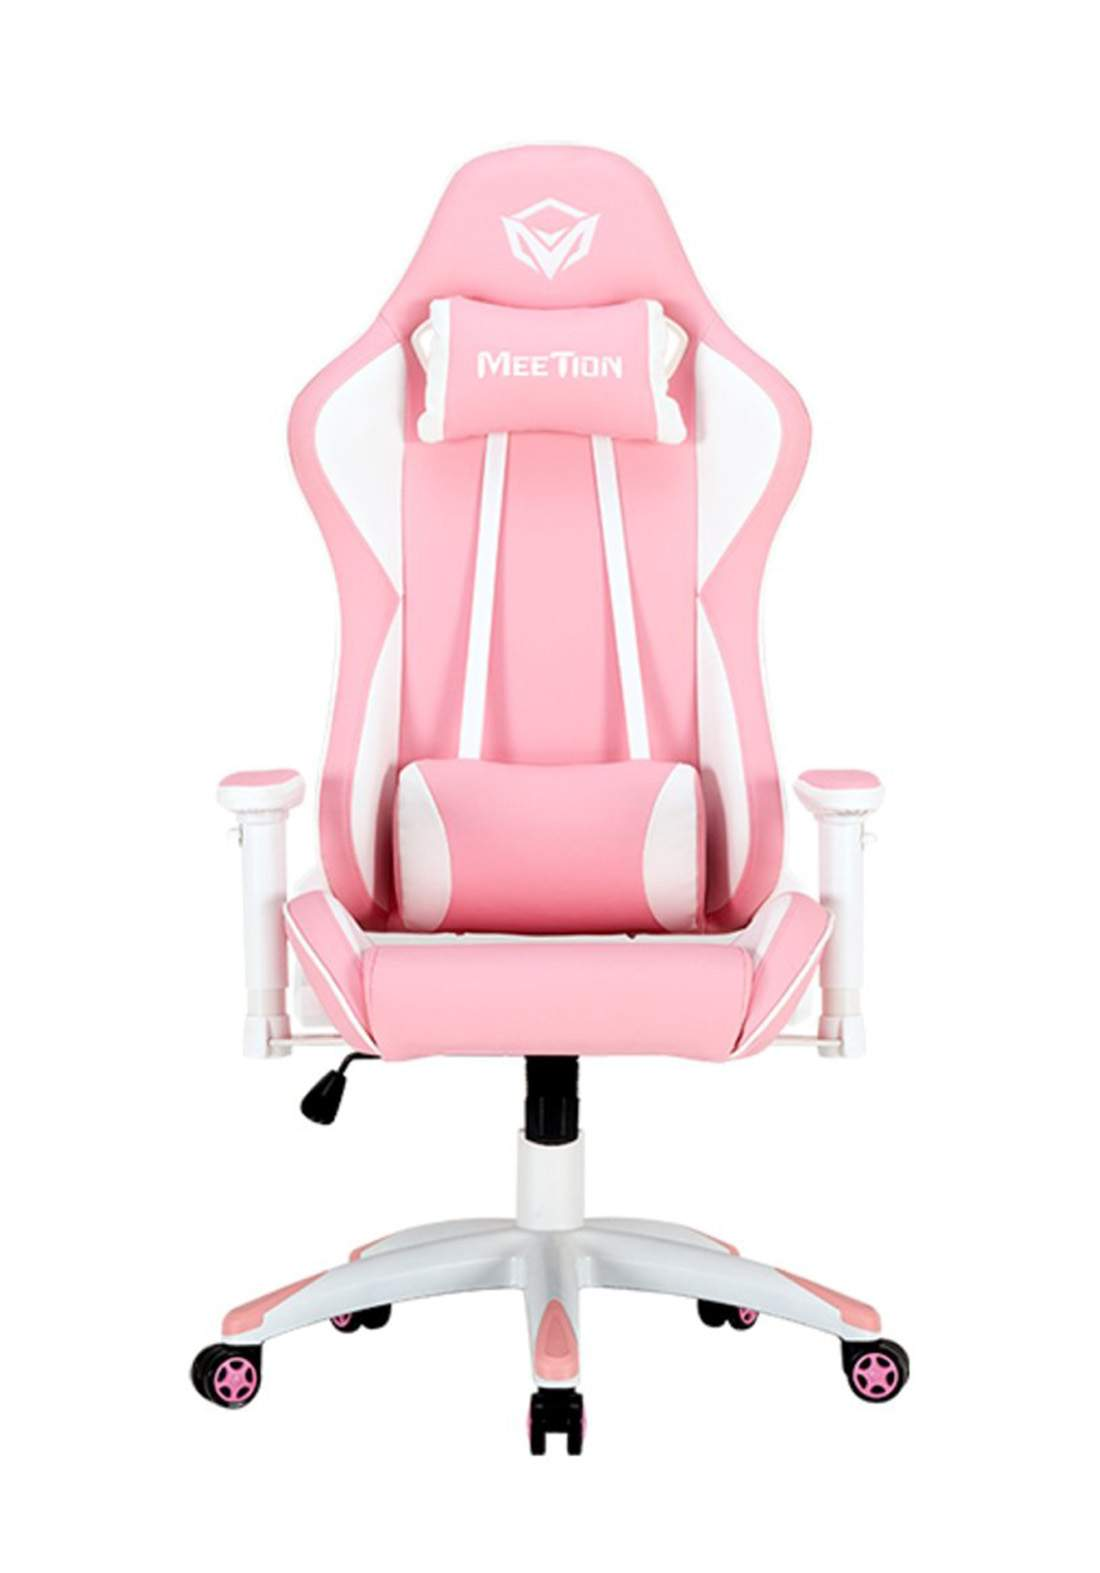 Meetion CHR16 E-Sport Gaming Chair - Pink كرسي ألعاب